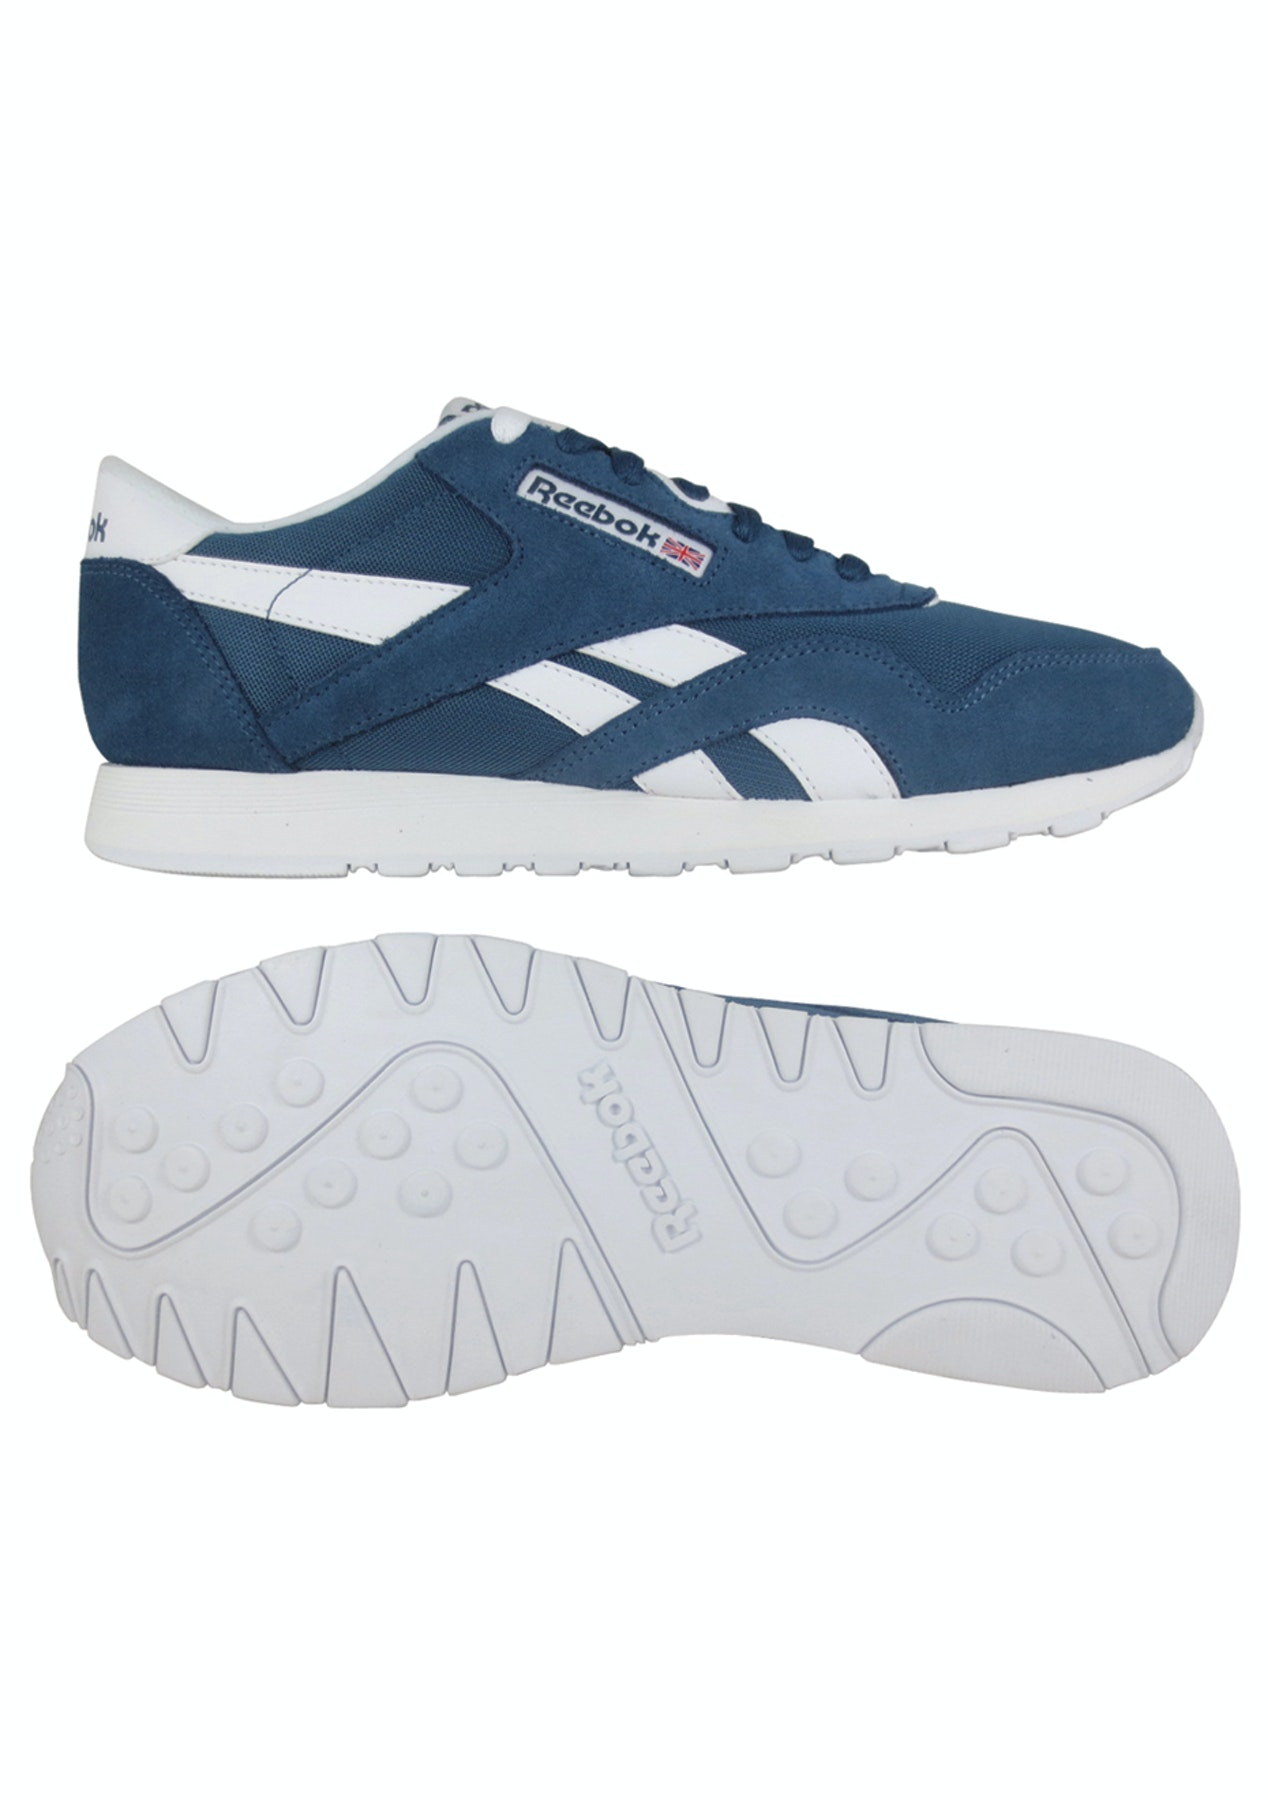 11fa713241b3c Reebok Mens - Classic Nylon Brave Blue White - Boxing Day Reebok   Puma -  Onceit